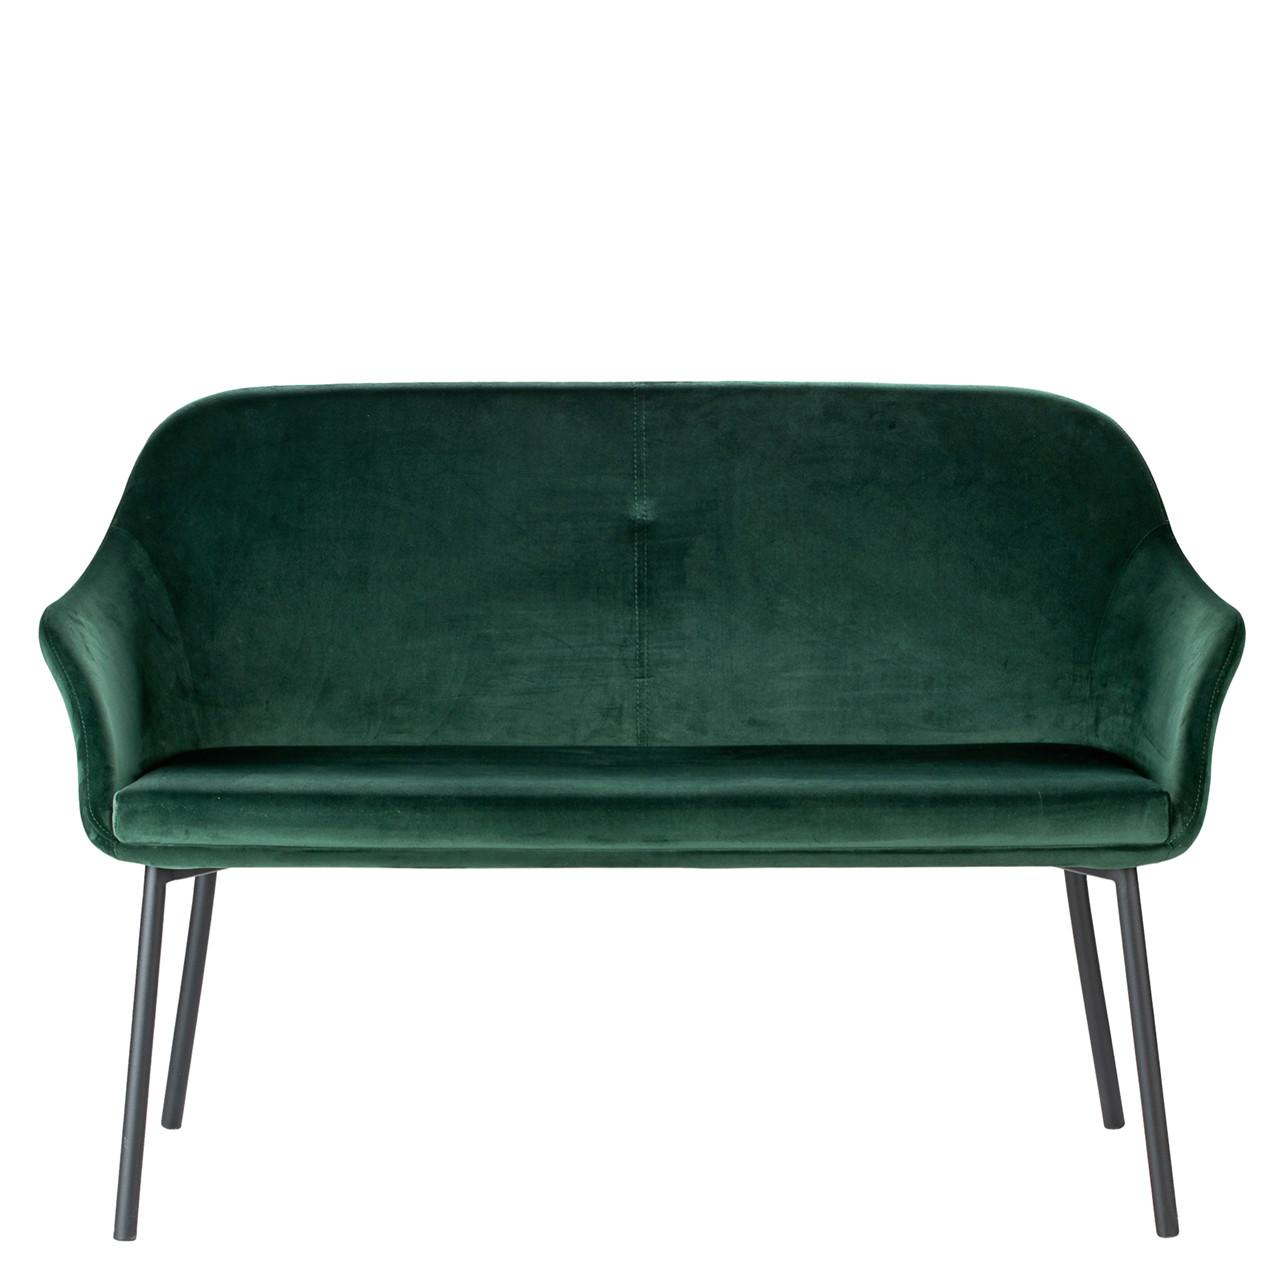 grøn sofa NEW AGE 2 pers. sofa grøn velour grøn sofa